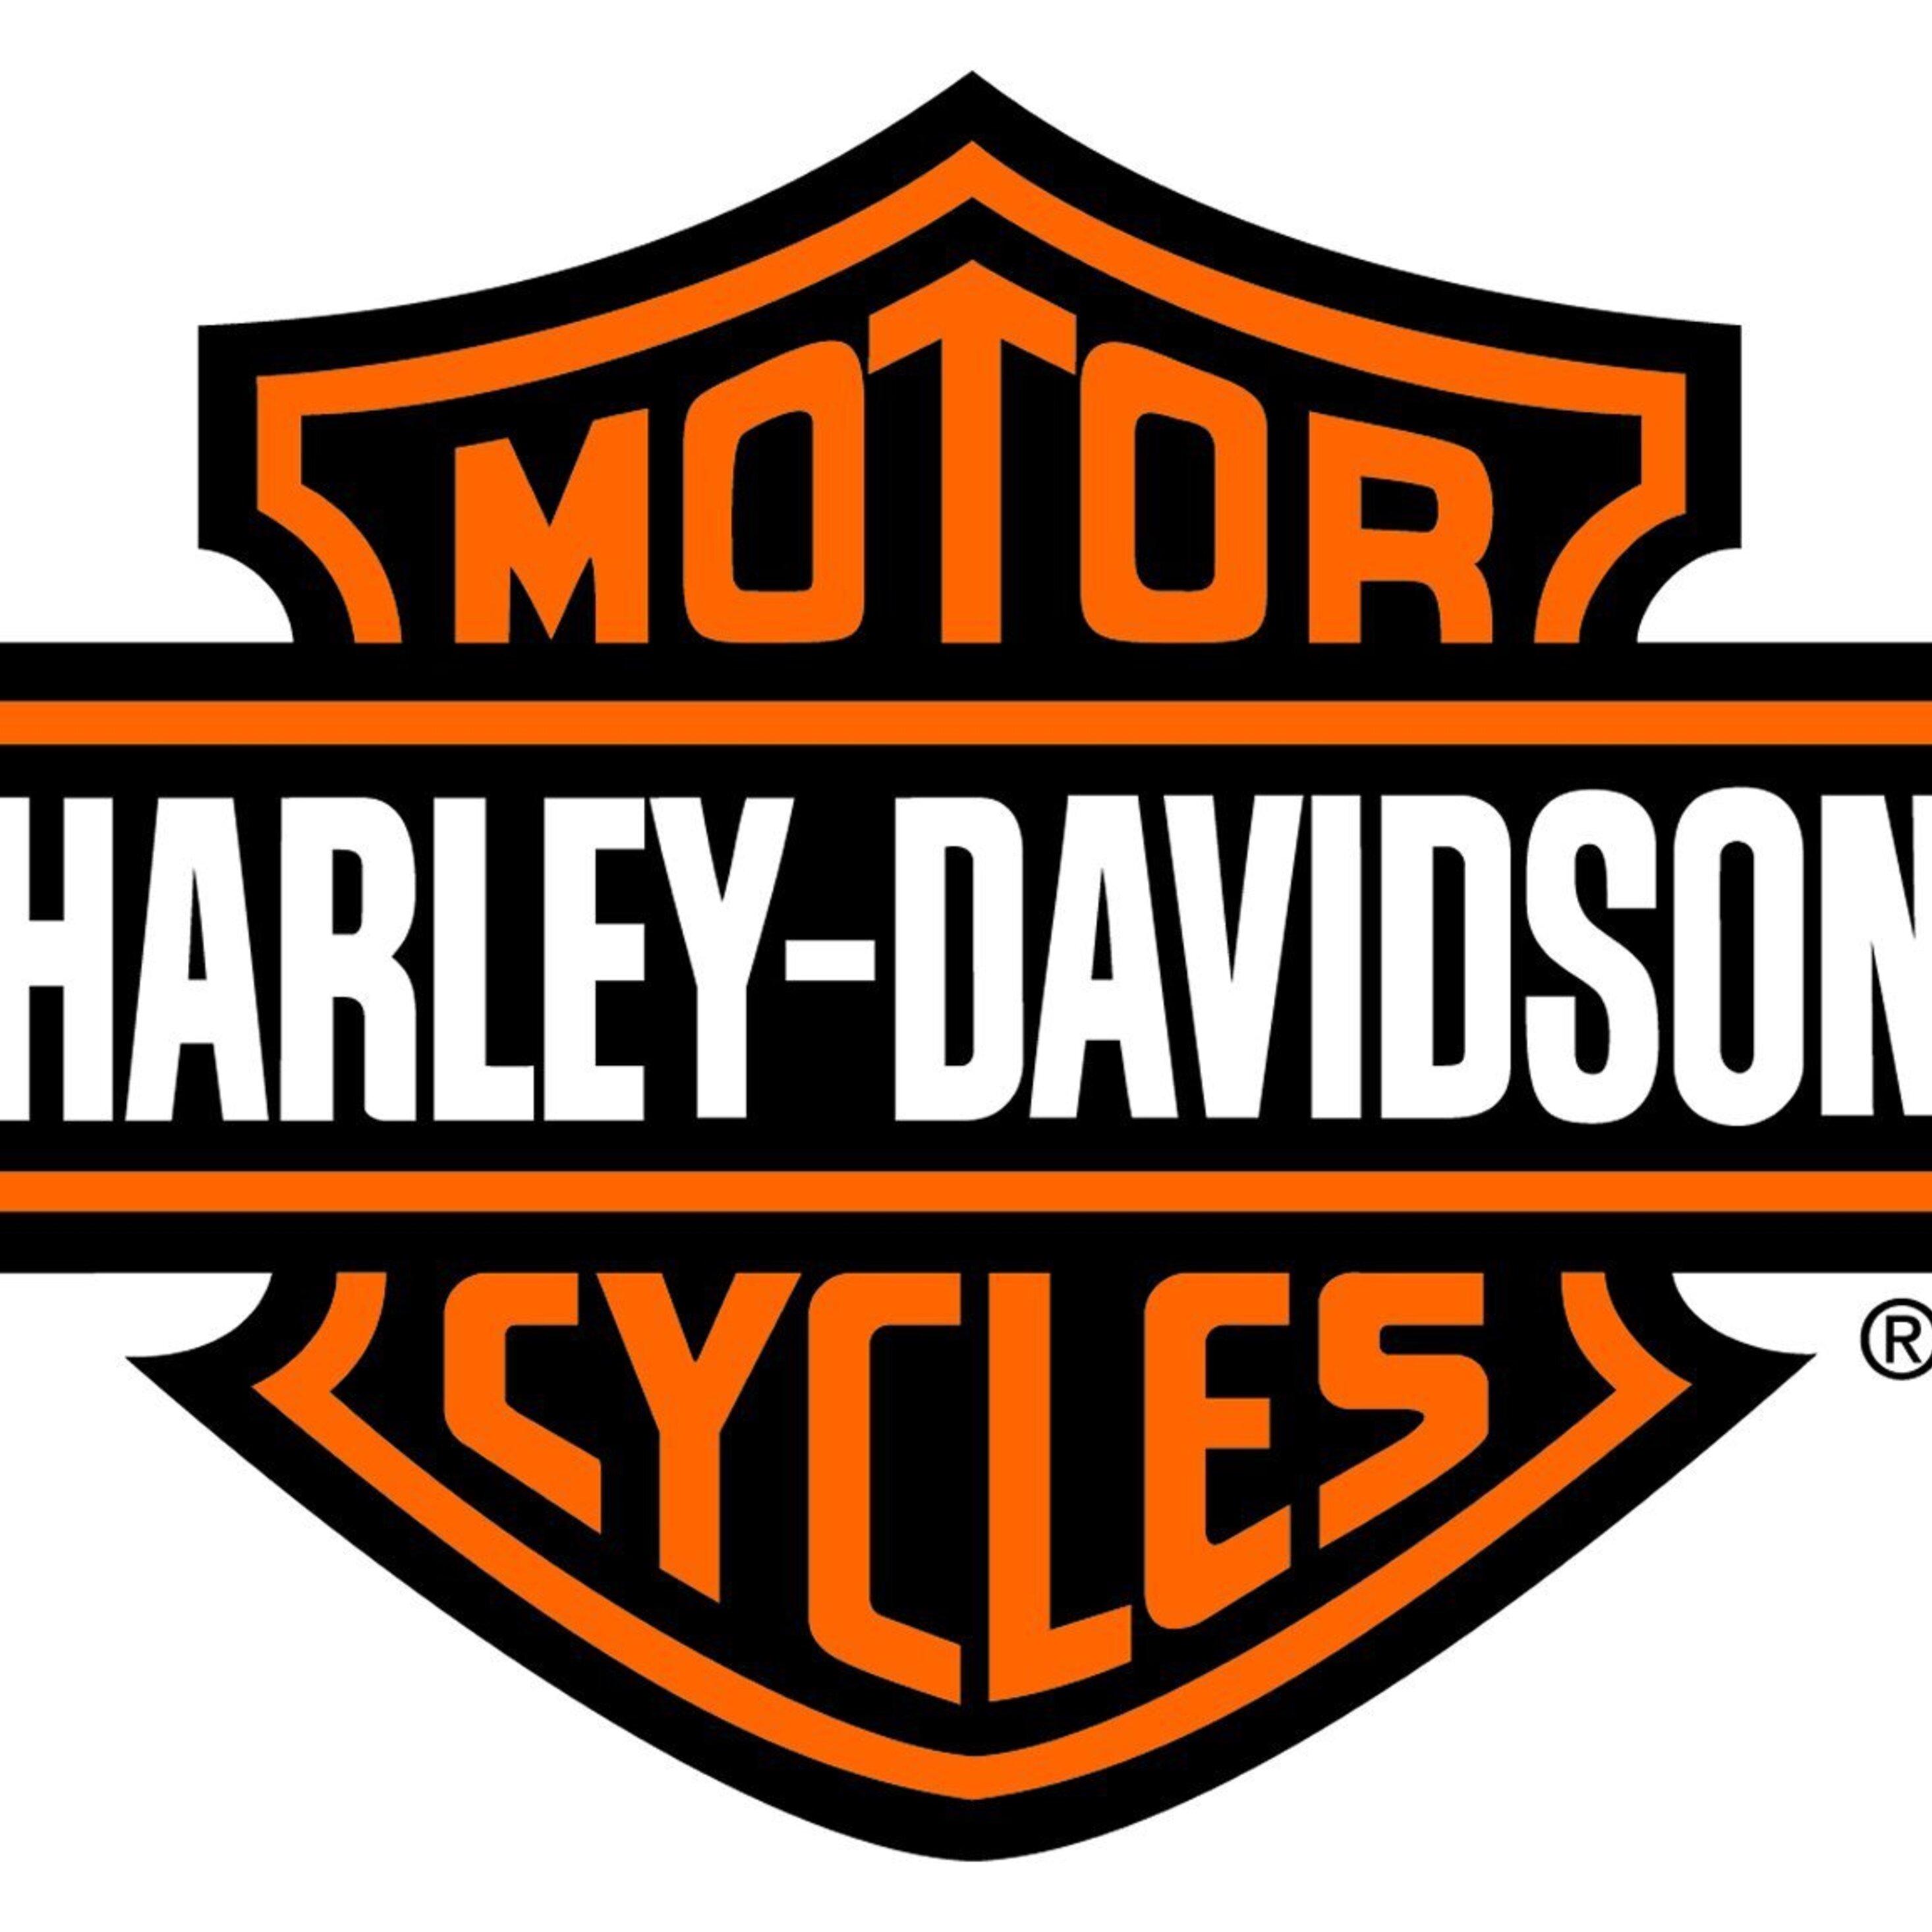 2932x2932 logo harley davidson motor cycles ipad pro retina display rh hdqwalls com harley davidson logo wallpaper computer harley davidson logo wallpaper mural for sale